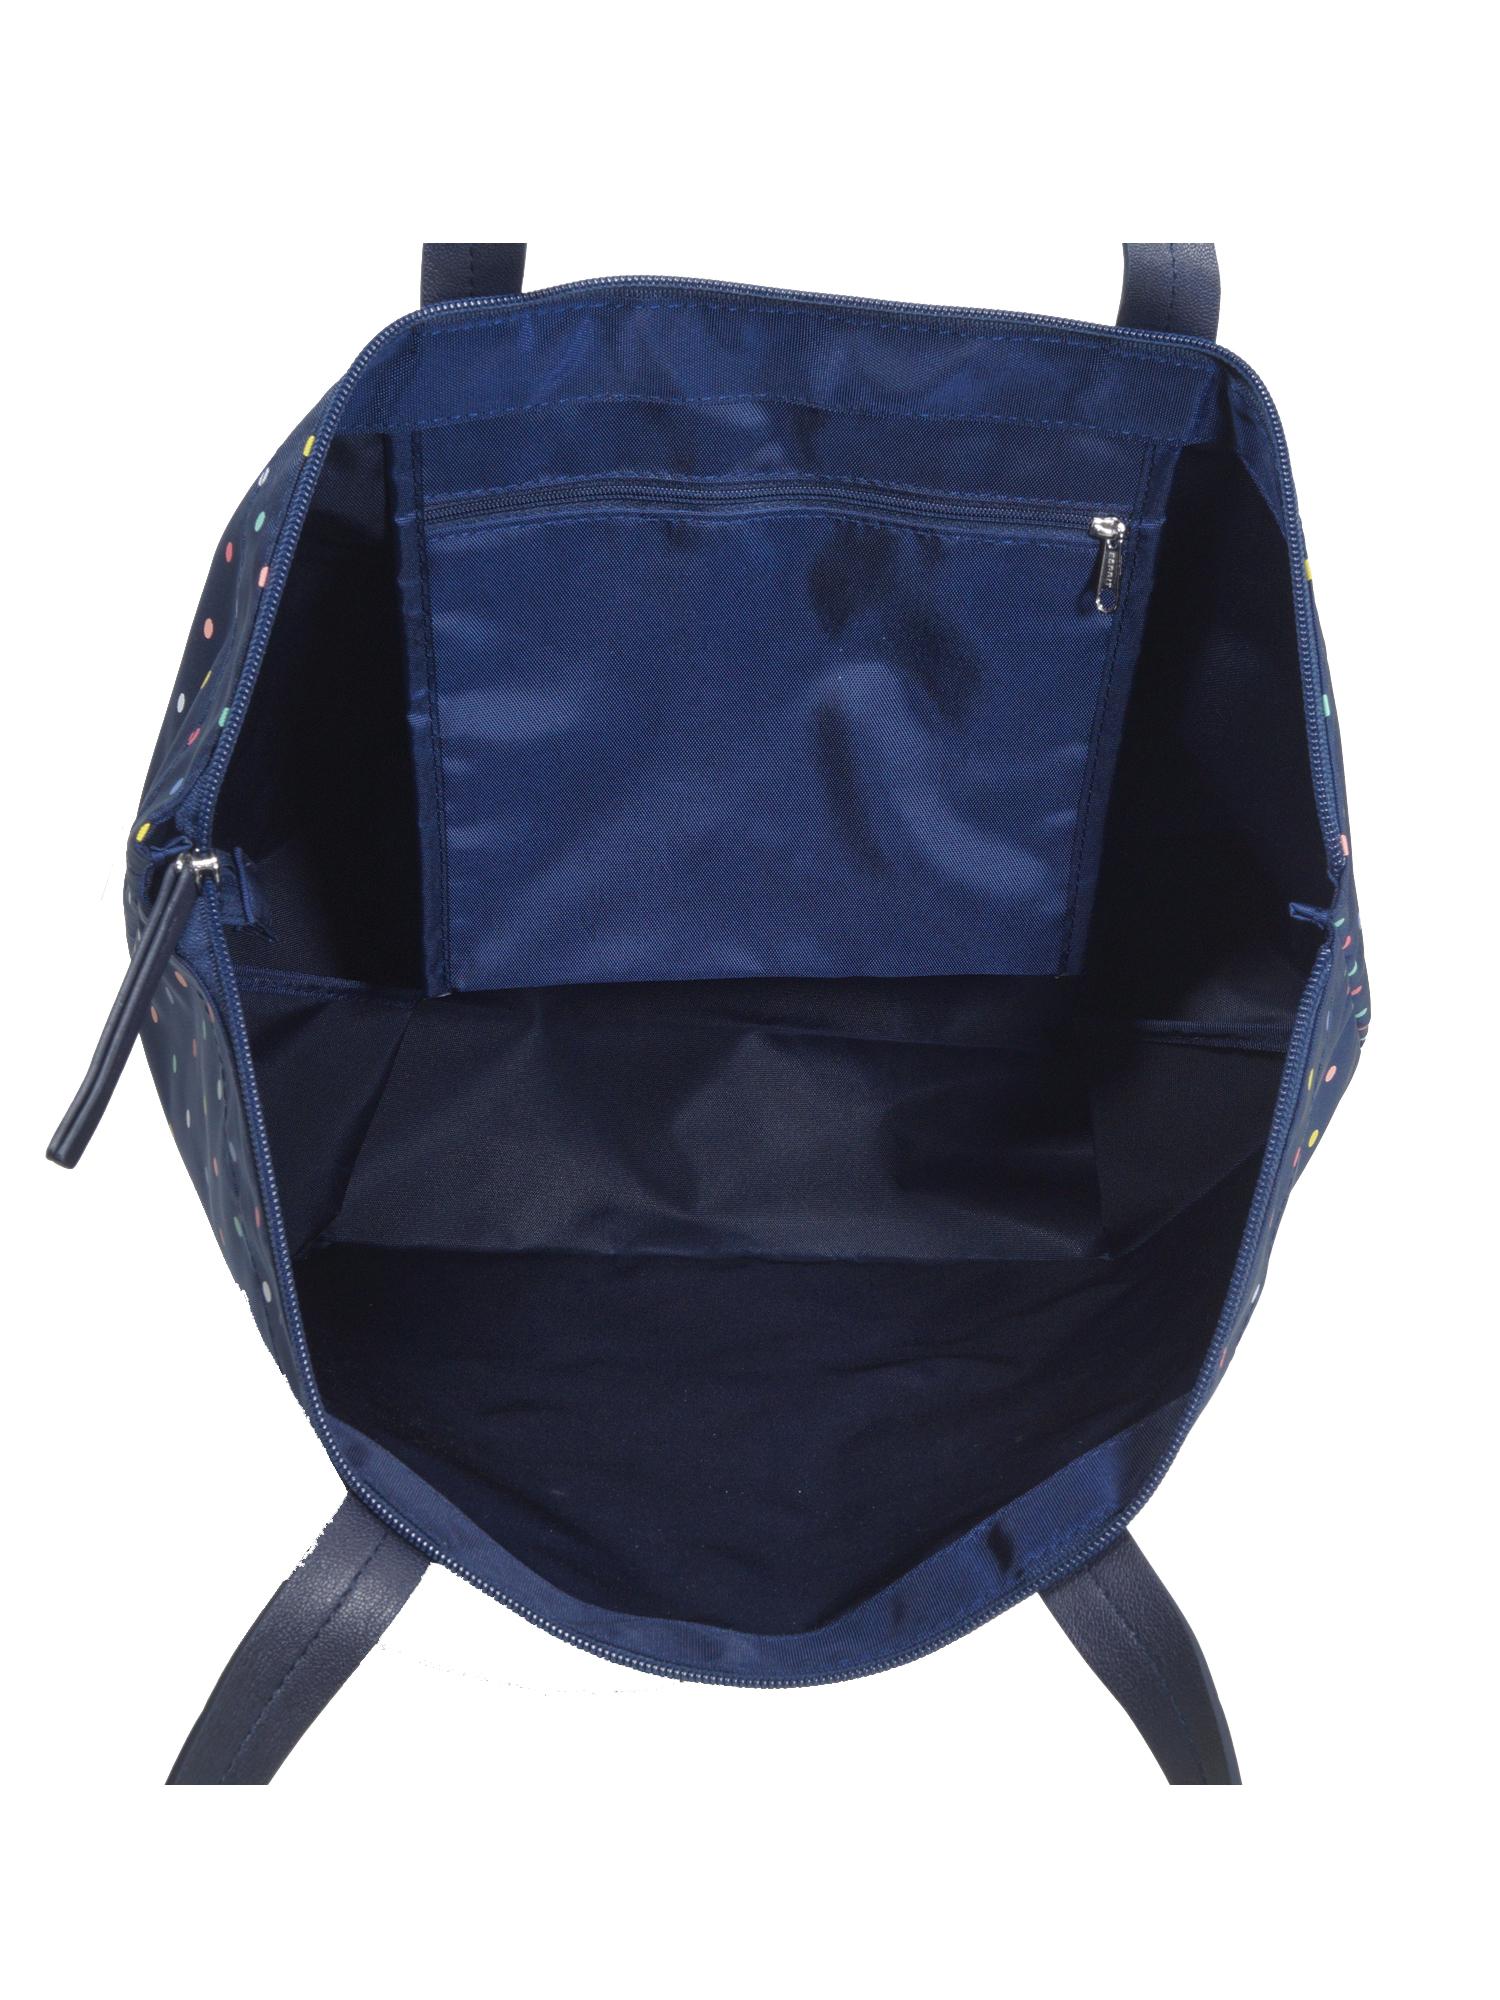 1f5e504d5fba2 ... Esprit Handtasche Tasche Shopper Cleo printed Blau 019EA1O022-401 2